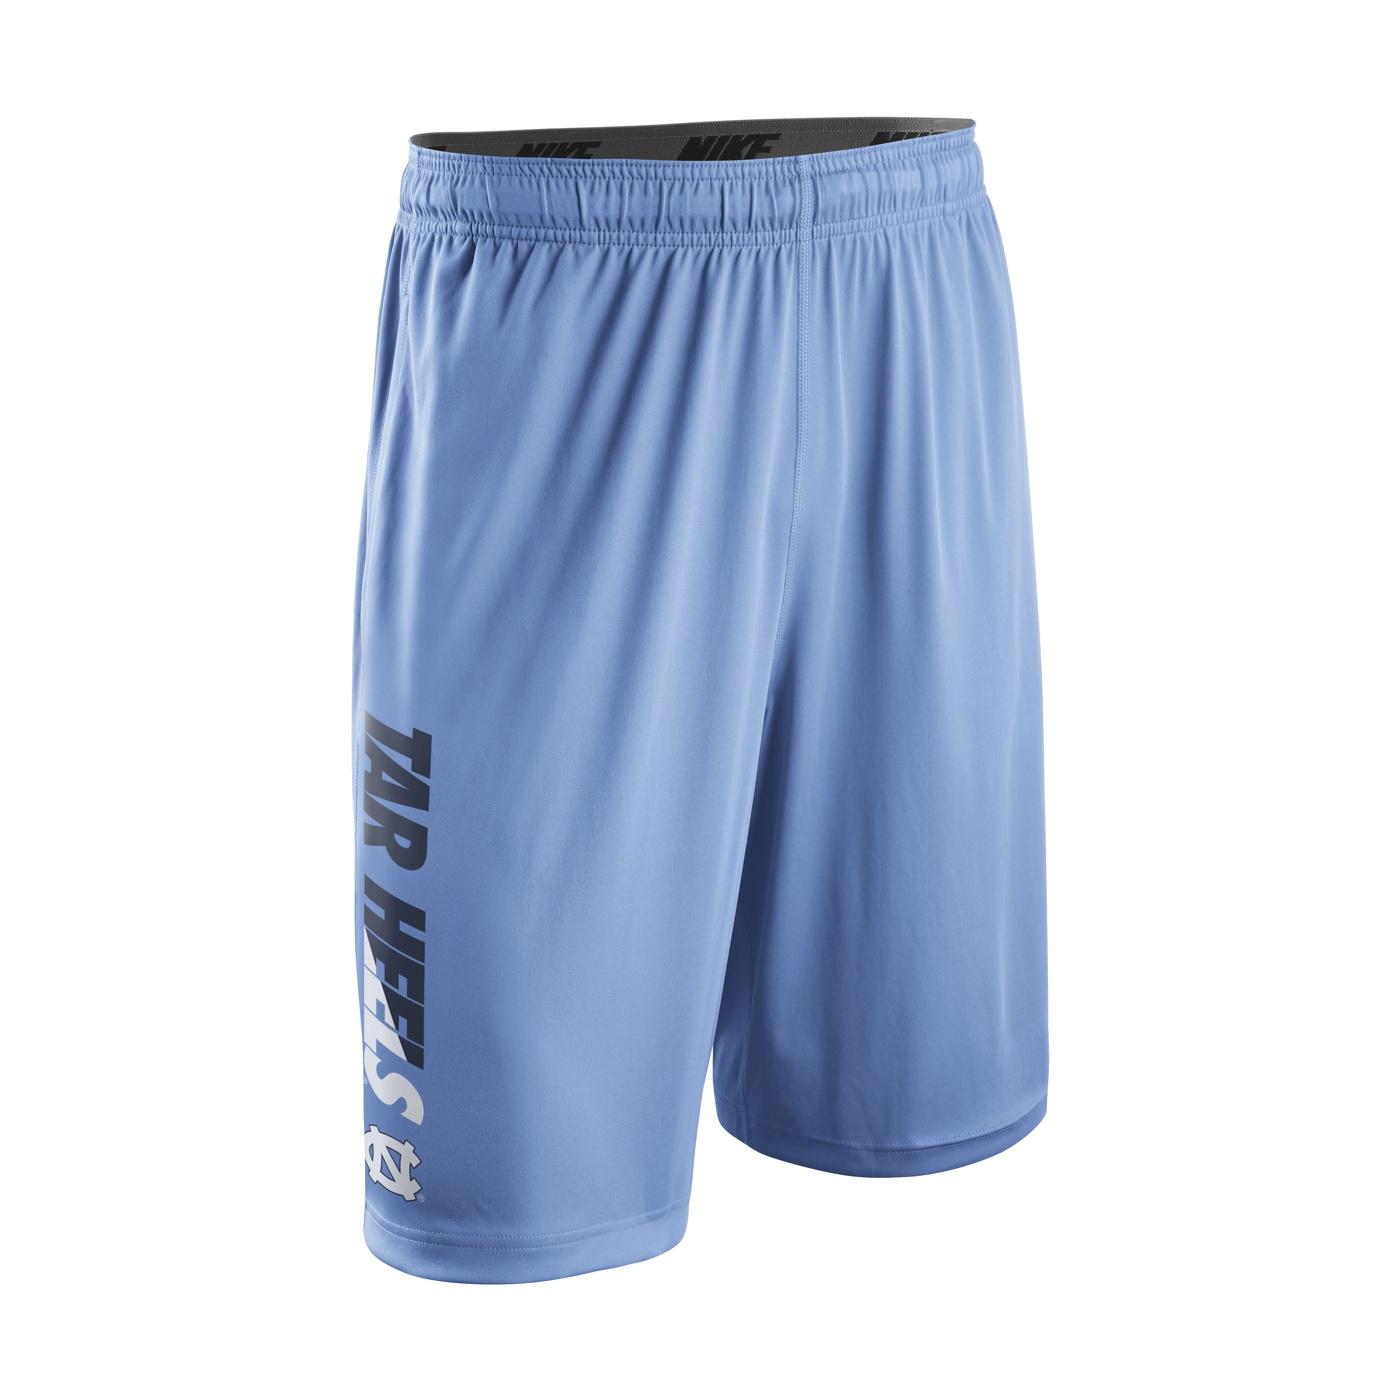 Johnny T-shirt - North Carolina Tar Heels - Nike Practice Fly ...